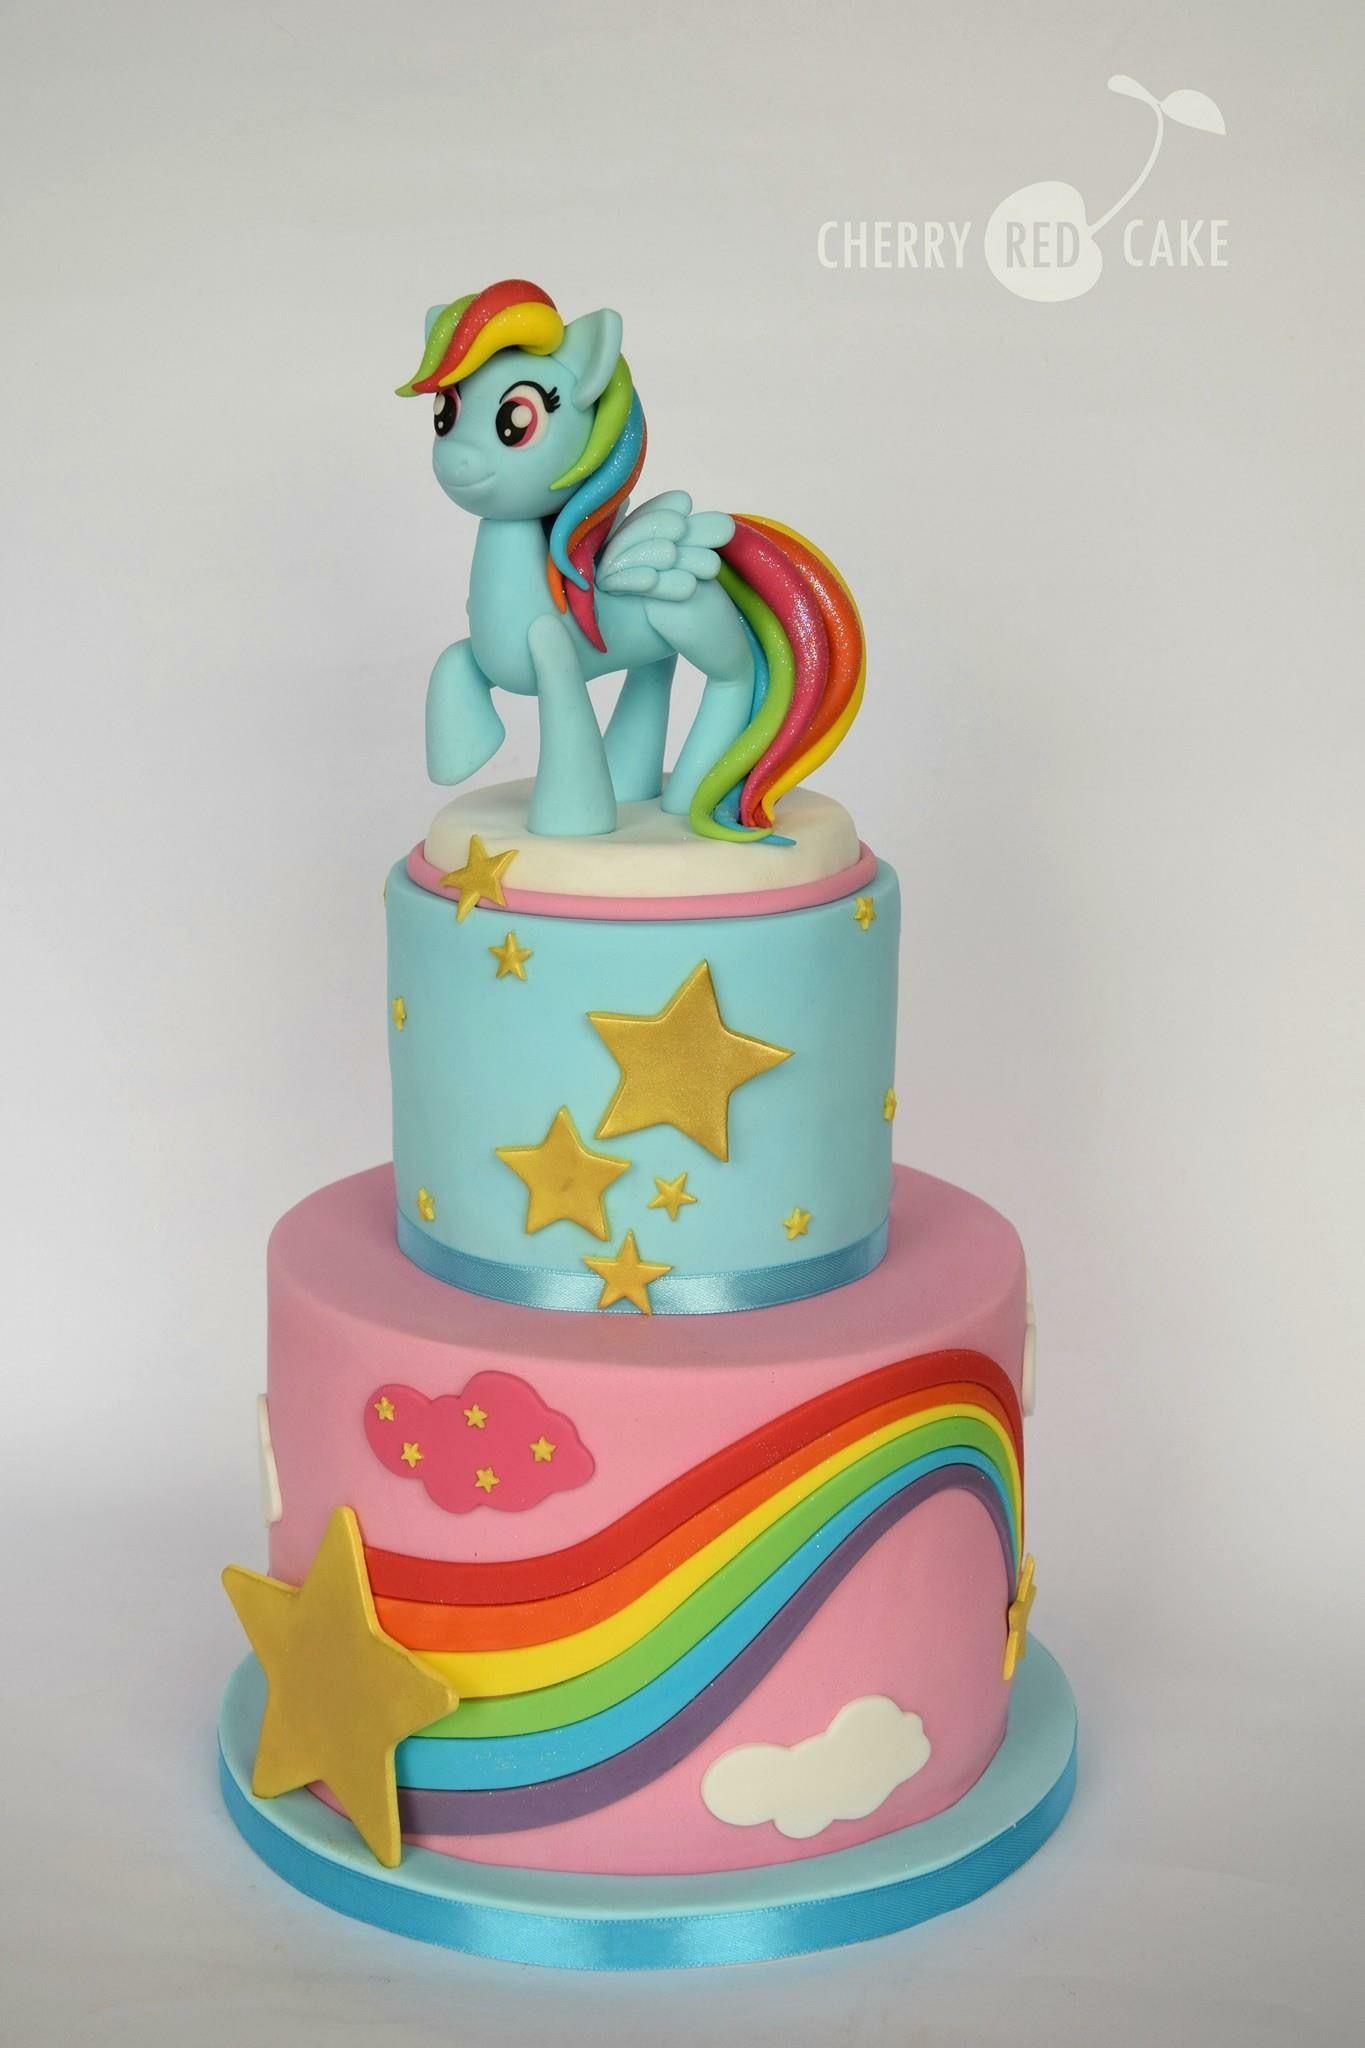 Pleasing Rainbow Dash Cake Rainbow Dash Cake Rainbow Dash Birthday Pony Funny Birthday Cards Online Fluifree Goldxyz